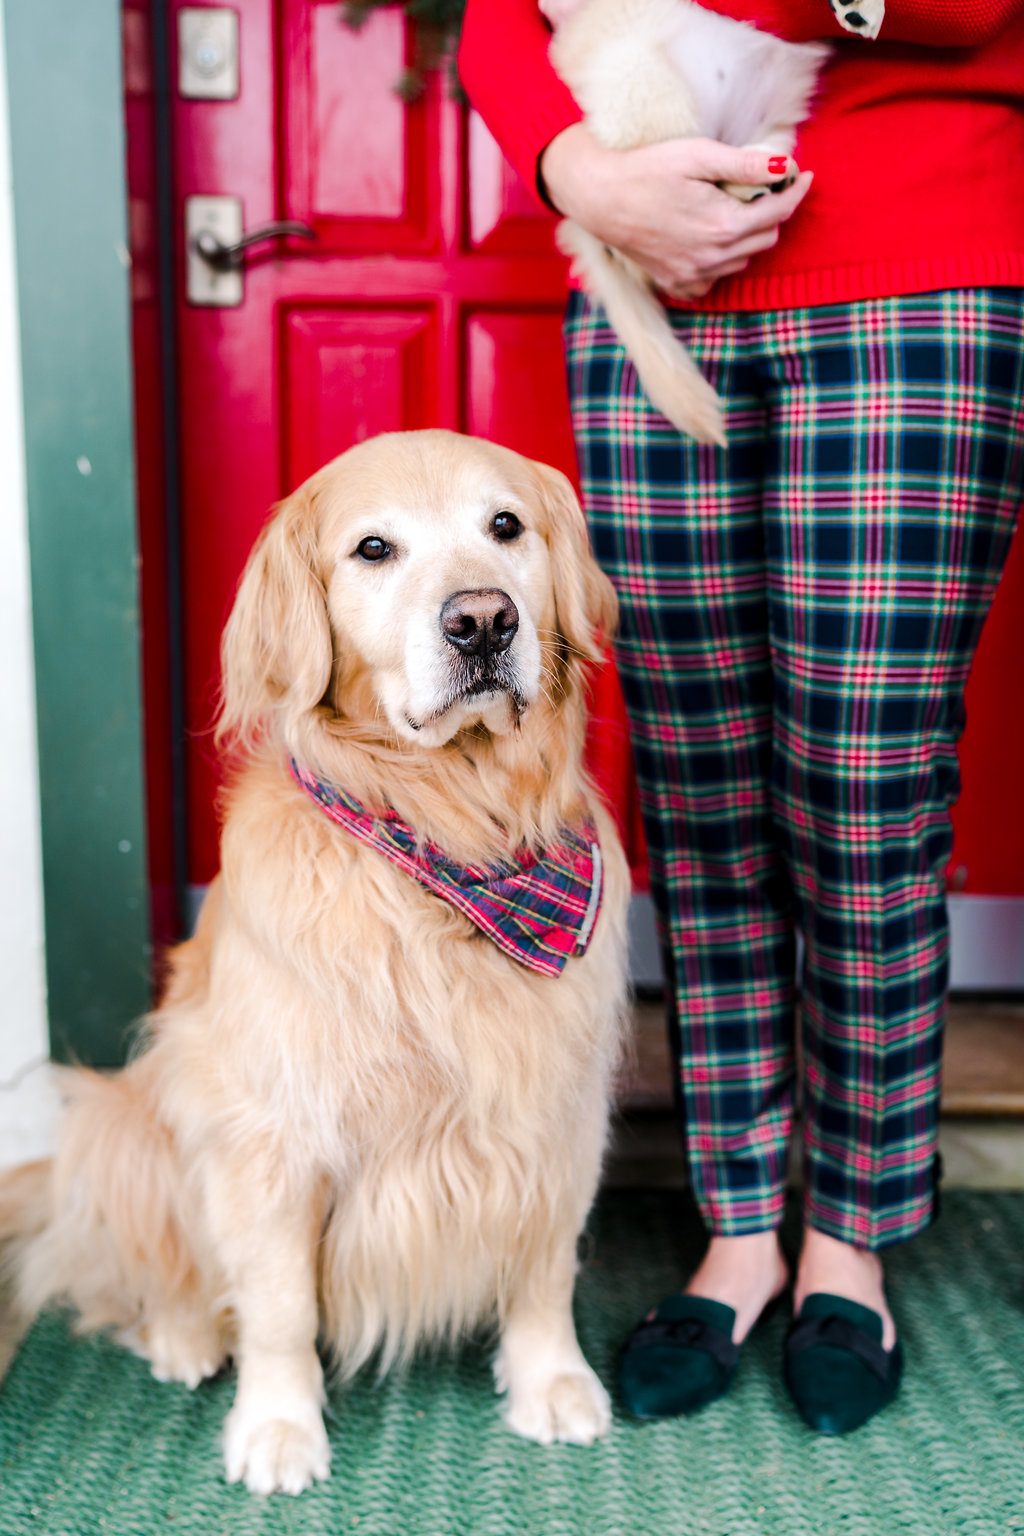 RODEOCOPHOTO_AbbyCapalbo_December_-15.jpgVermont Ski House Chalet Golden Retriever Puppy